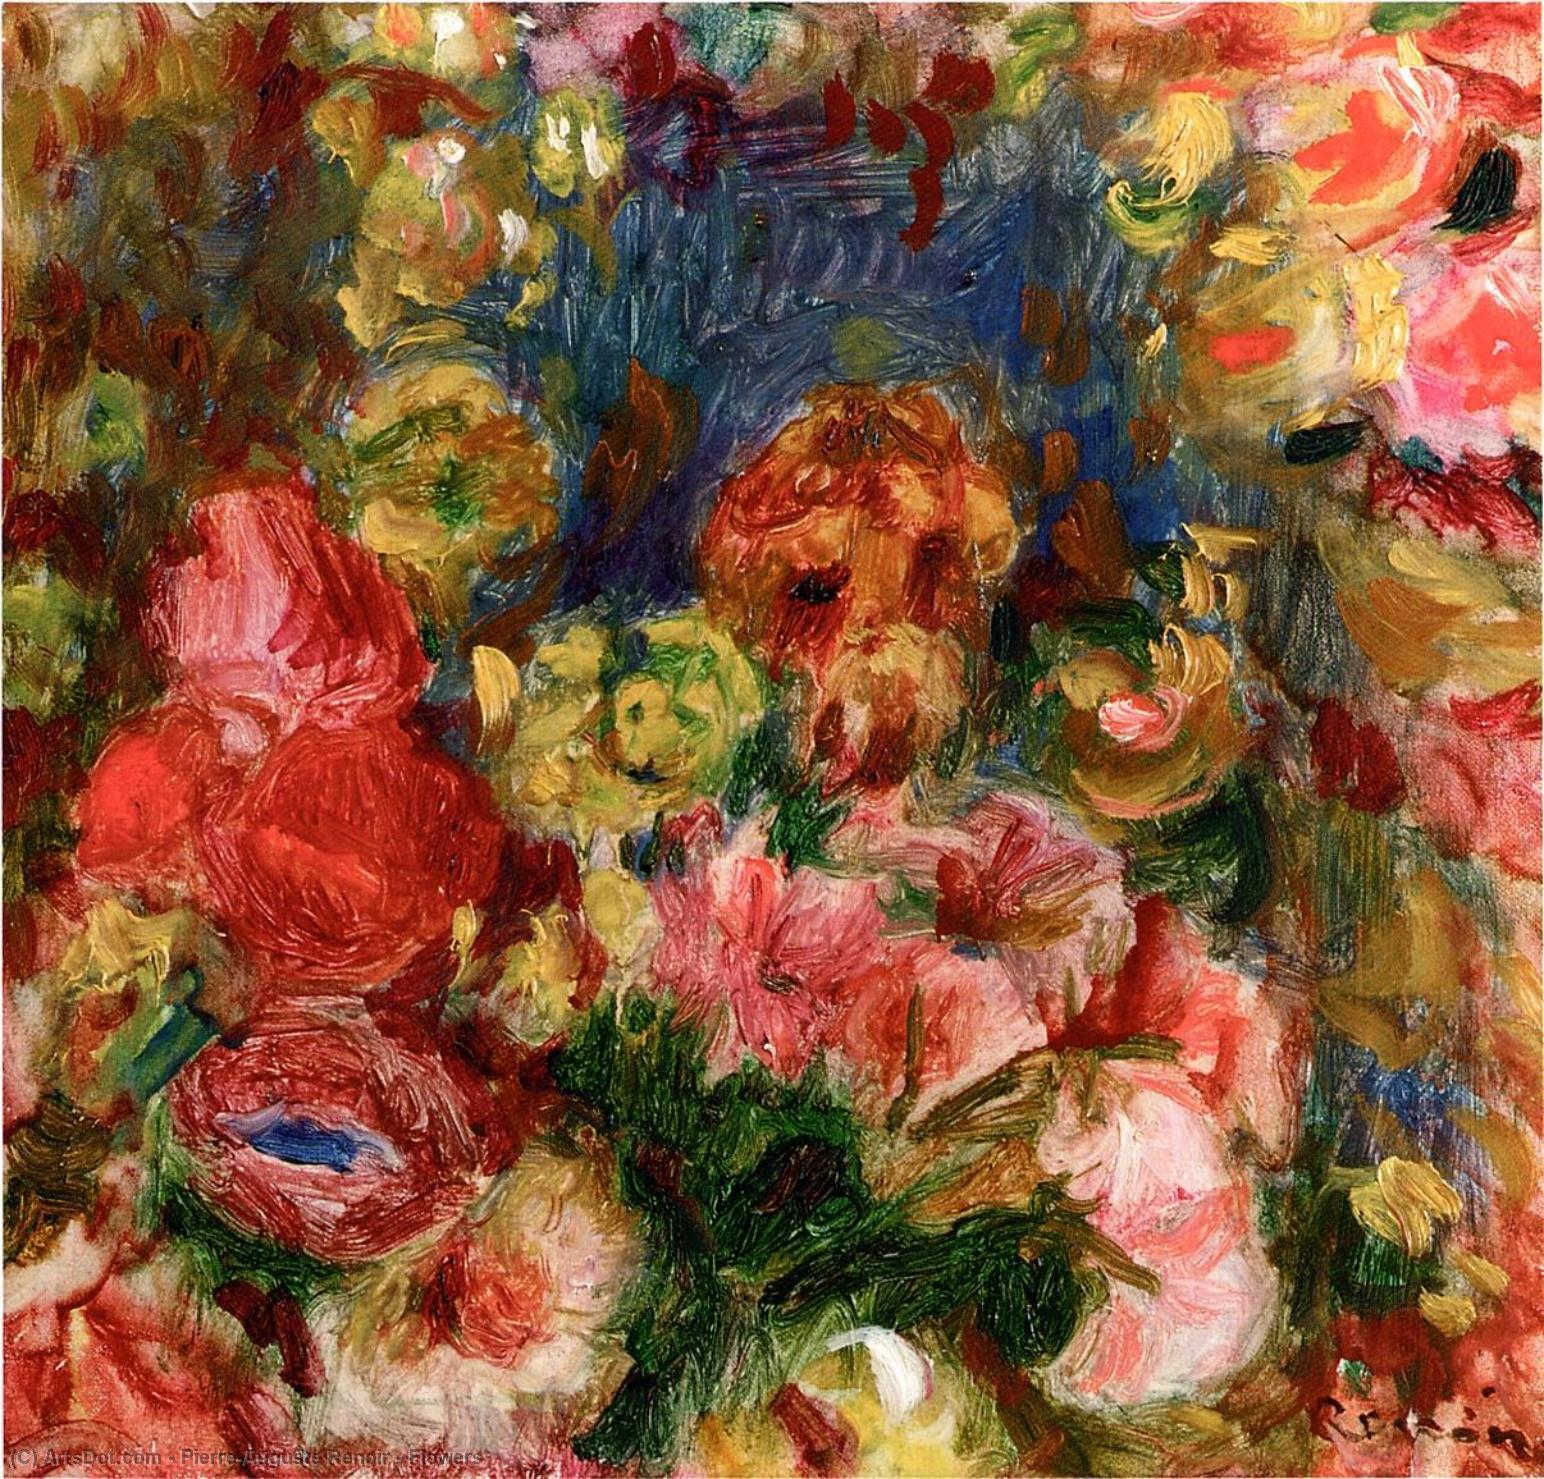 Wikioo.org - The Encyclopedia of Fine Arts - Painting, Artwork by Pierre-Auguste Renoir - Flowers